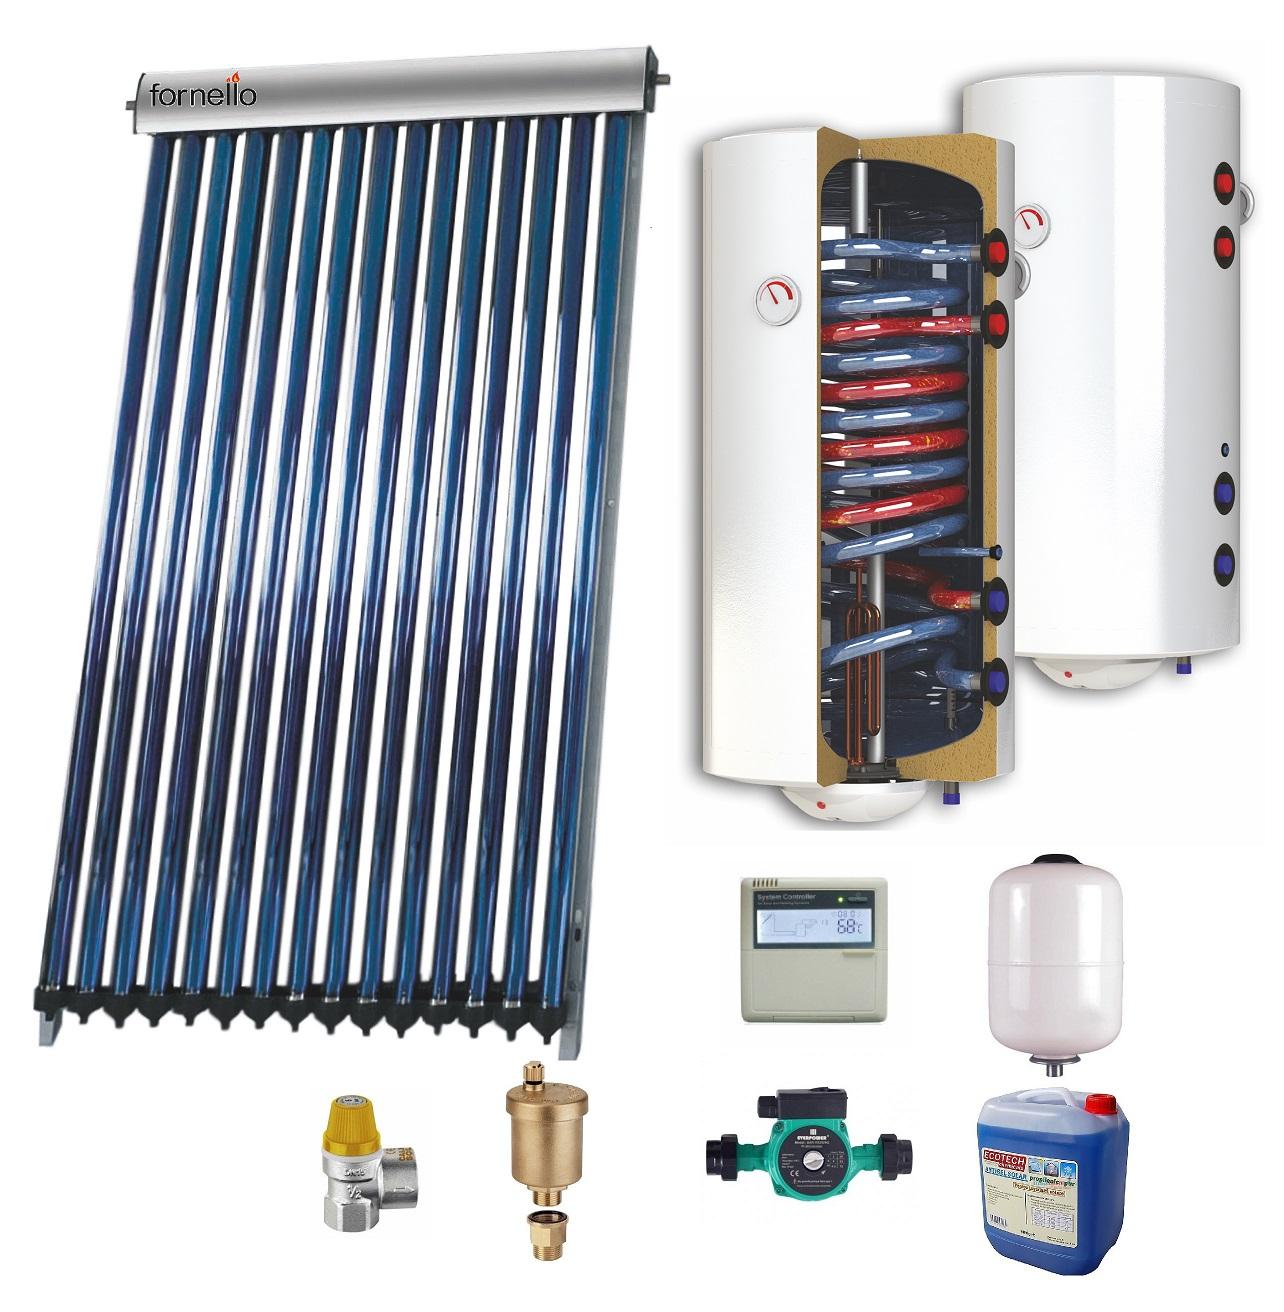 Sistem solar presurizat , panou Sunsystem VTC 30 tuburi, boiler cu 2 serpentine si rezistenta electrica Sunsystem 200 litri, pompa 25-60, controller, vas expansiune, antigel, supapa 1/2, aerisitor 1/2 fornello imagine